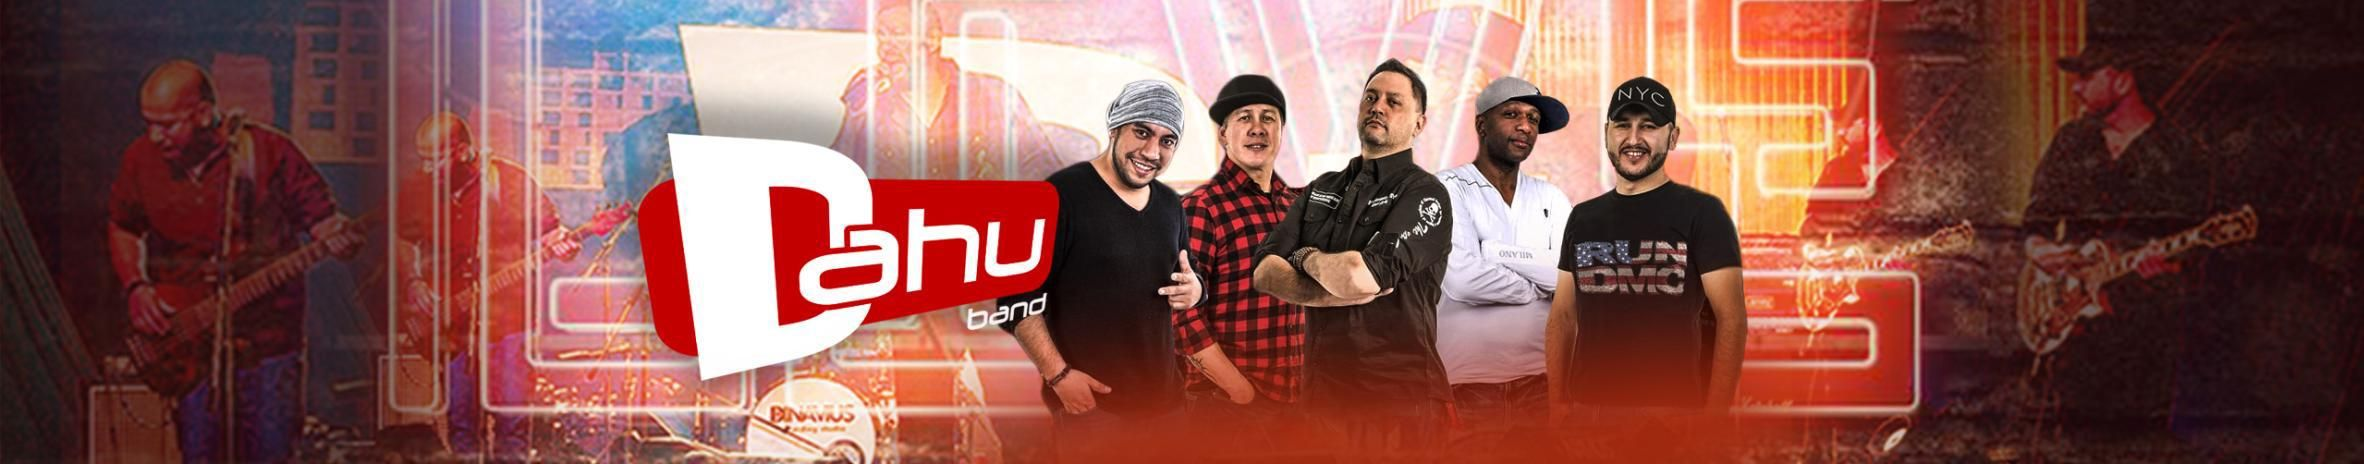 Imagem de capa de Banda DaHu